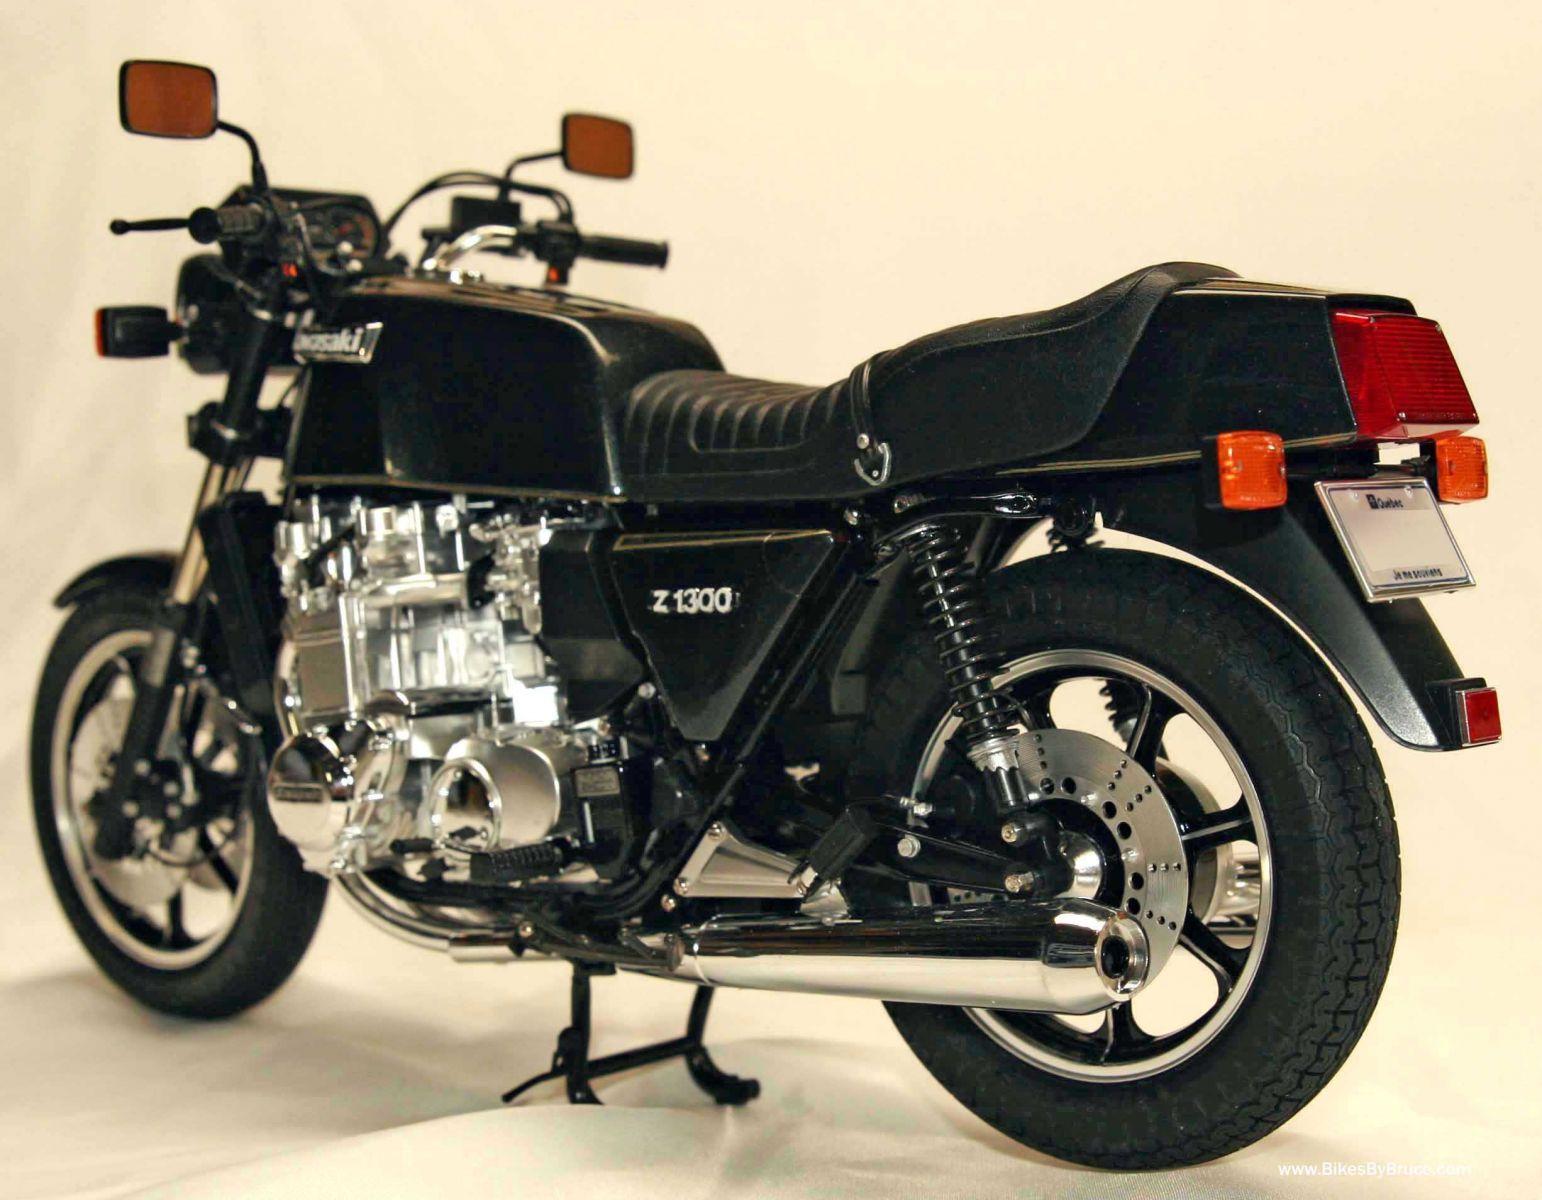 kawazaki z 1300 6 cylindres moto scooter motos doccasion